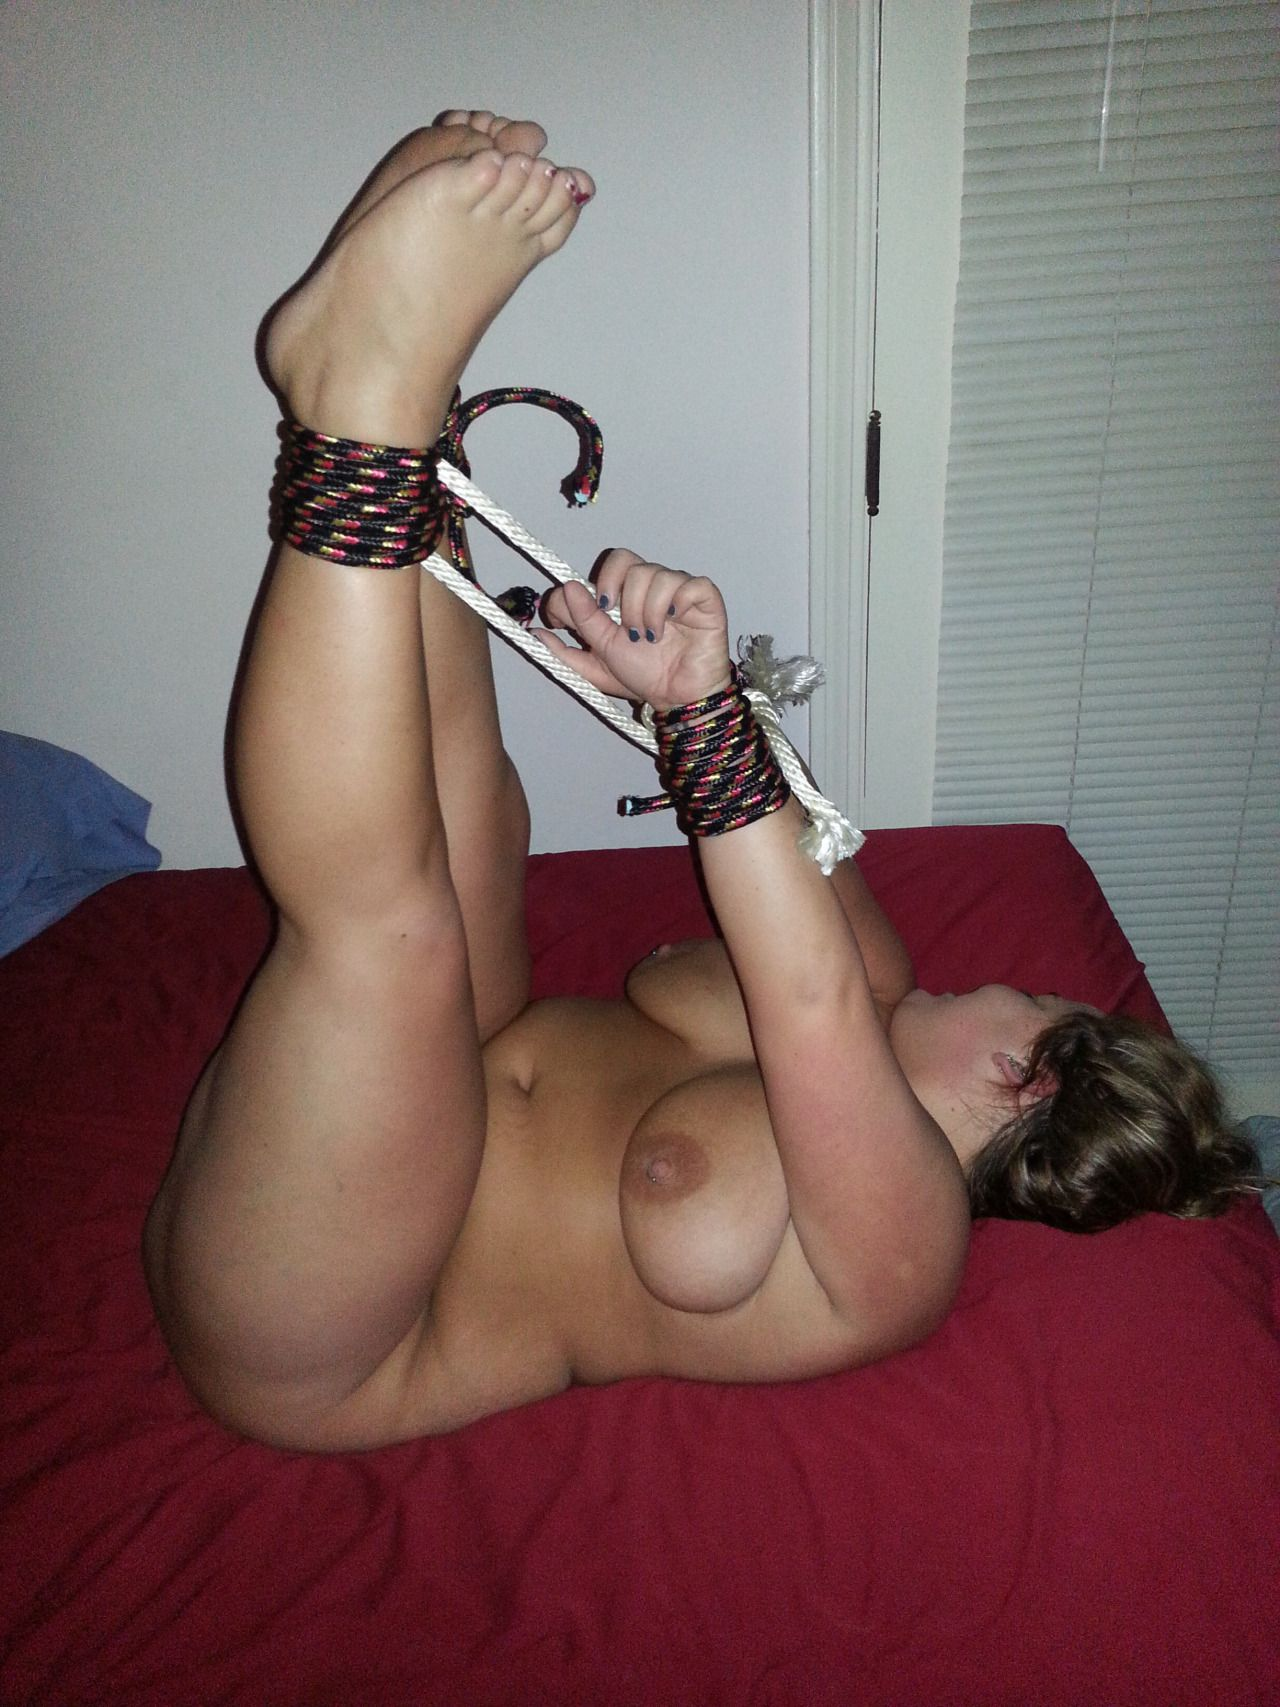 Firemouth reccomend Bbw bondage pics